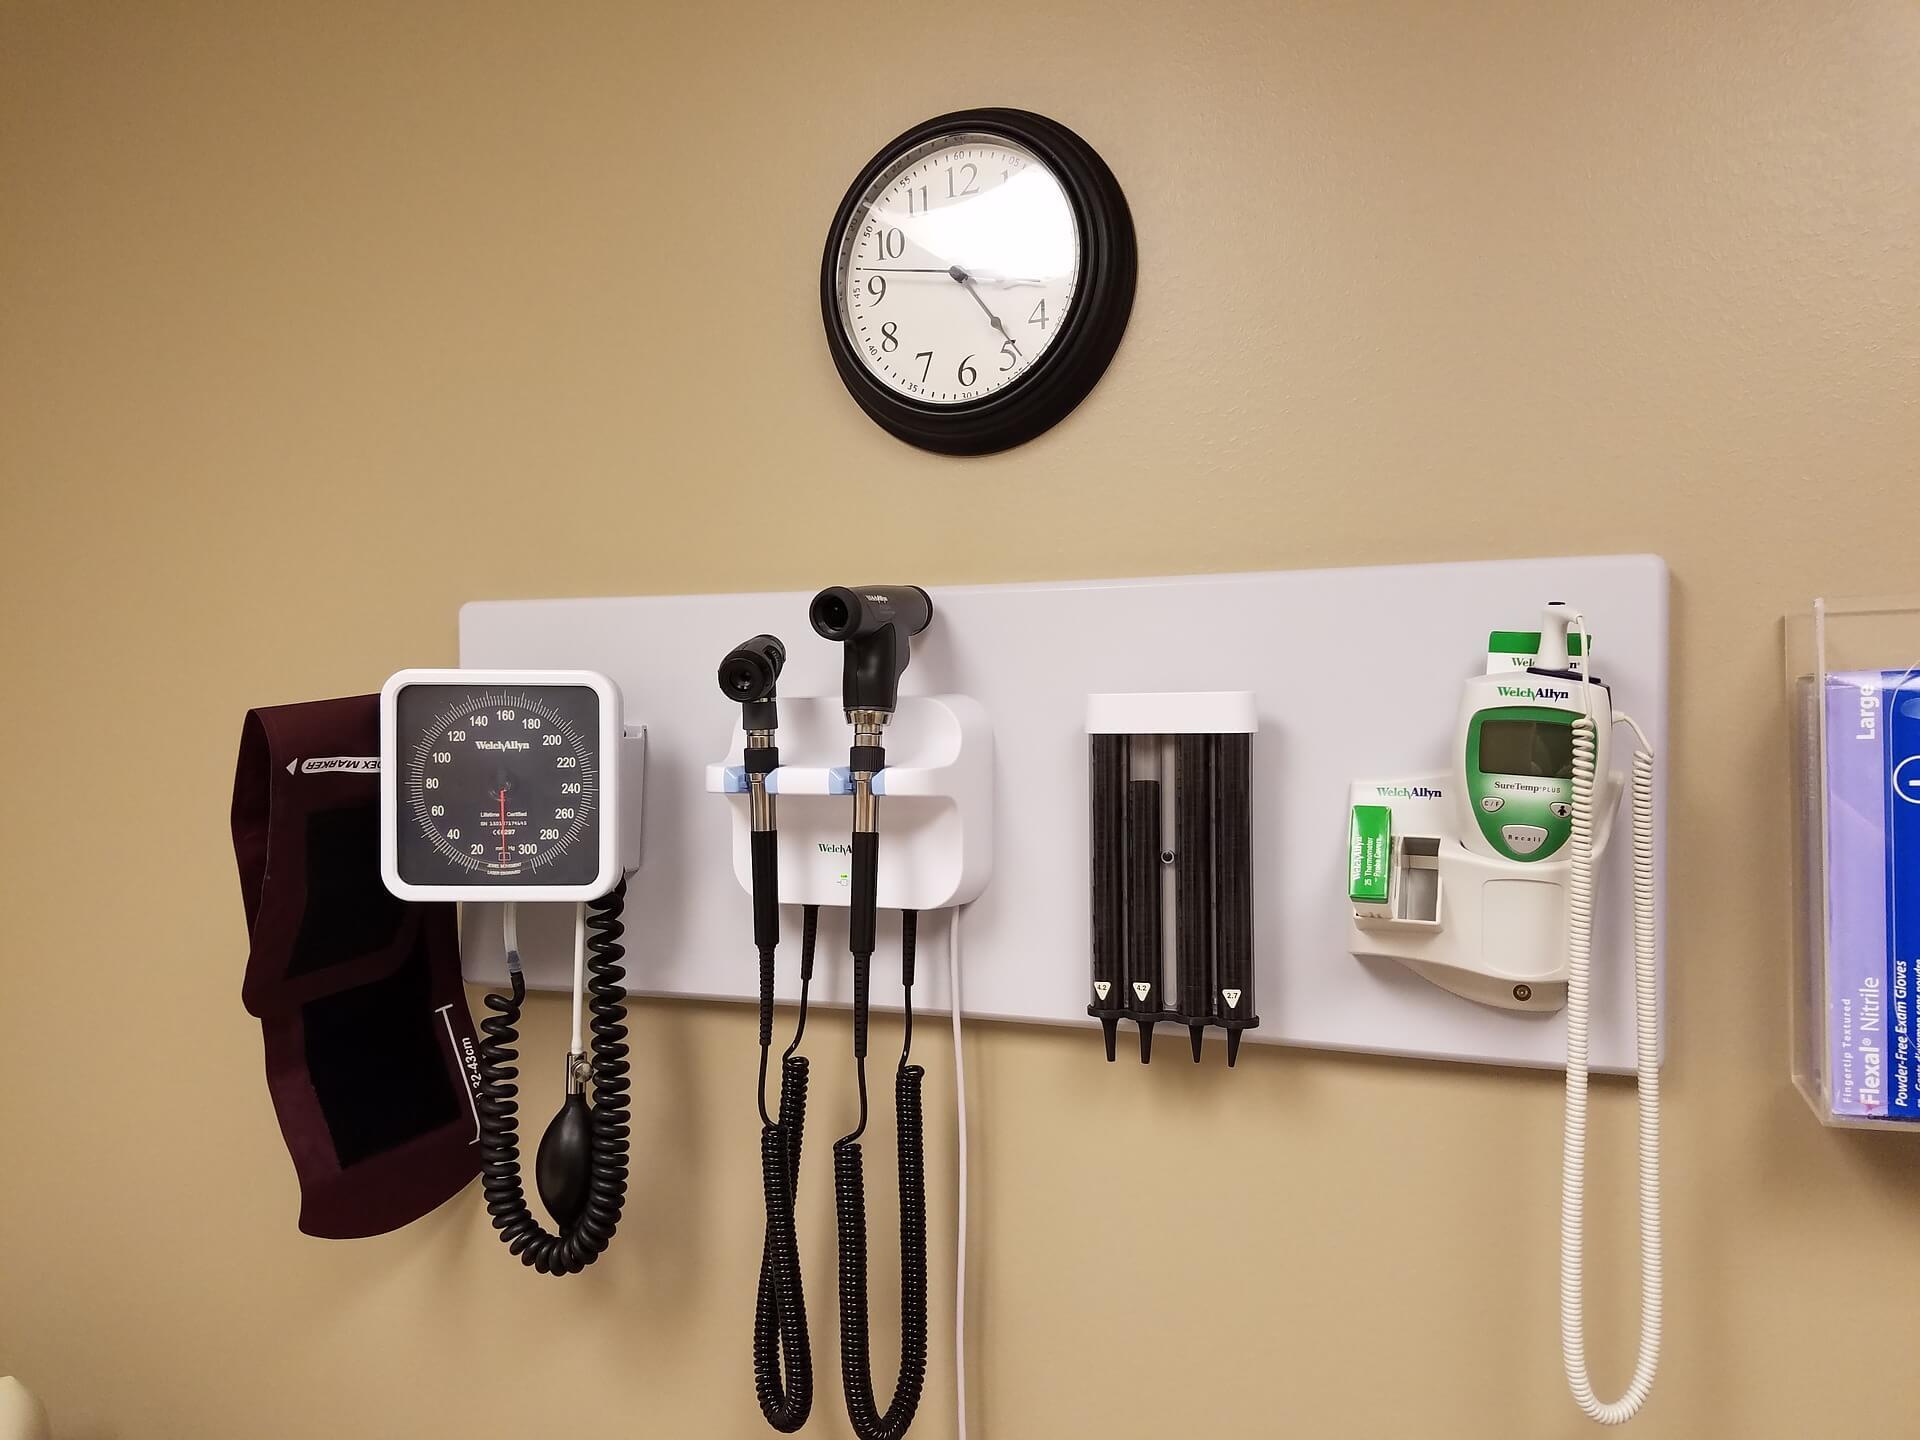 Chequeo médico masculino. Aparatos de consulta médica